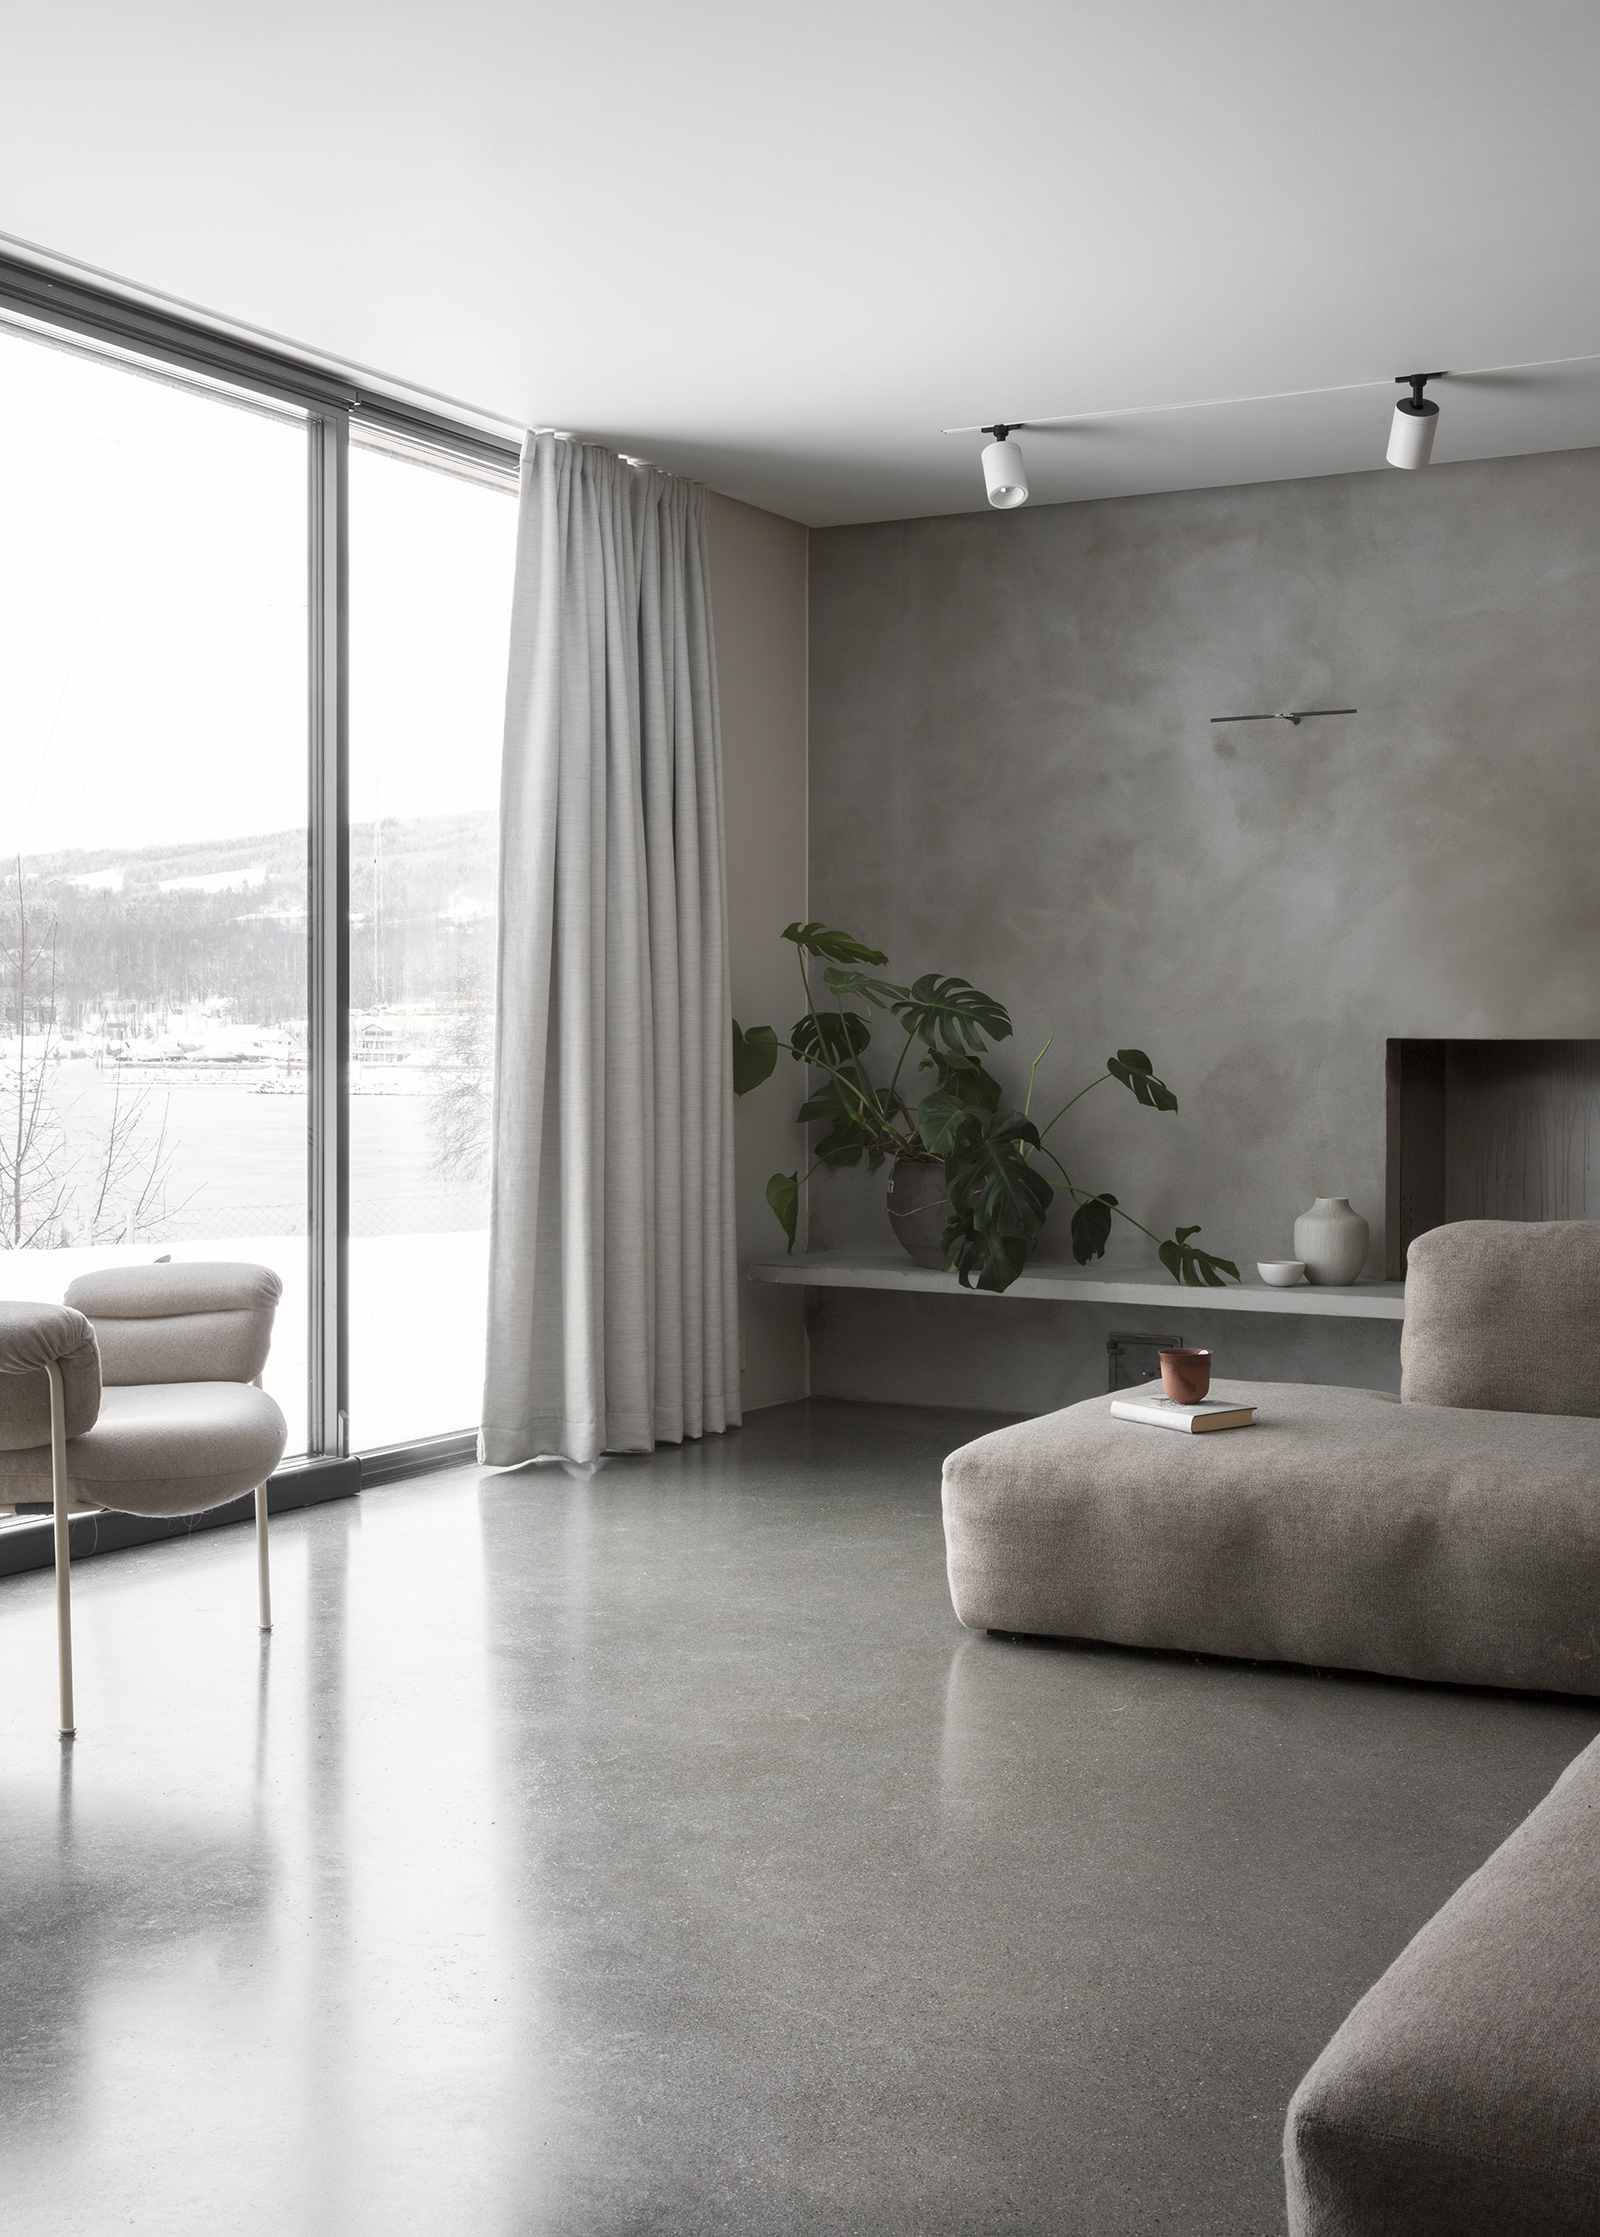 The gj vik house coco lapine designcoco lapine design for Design minimalista